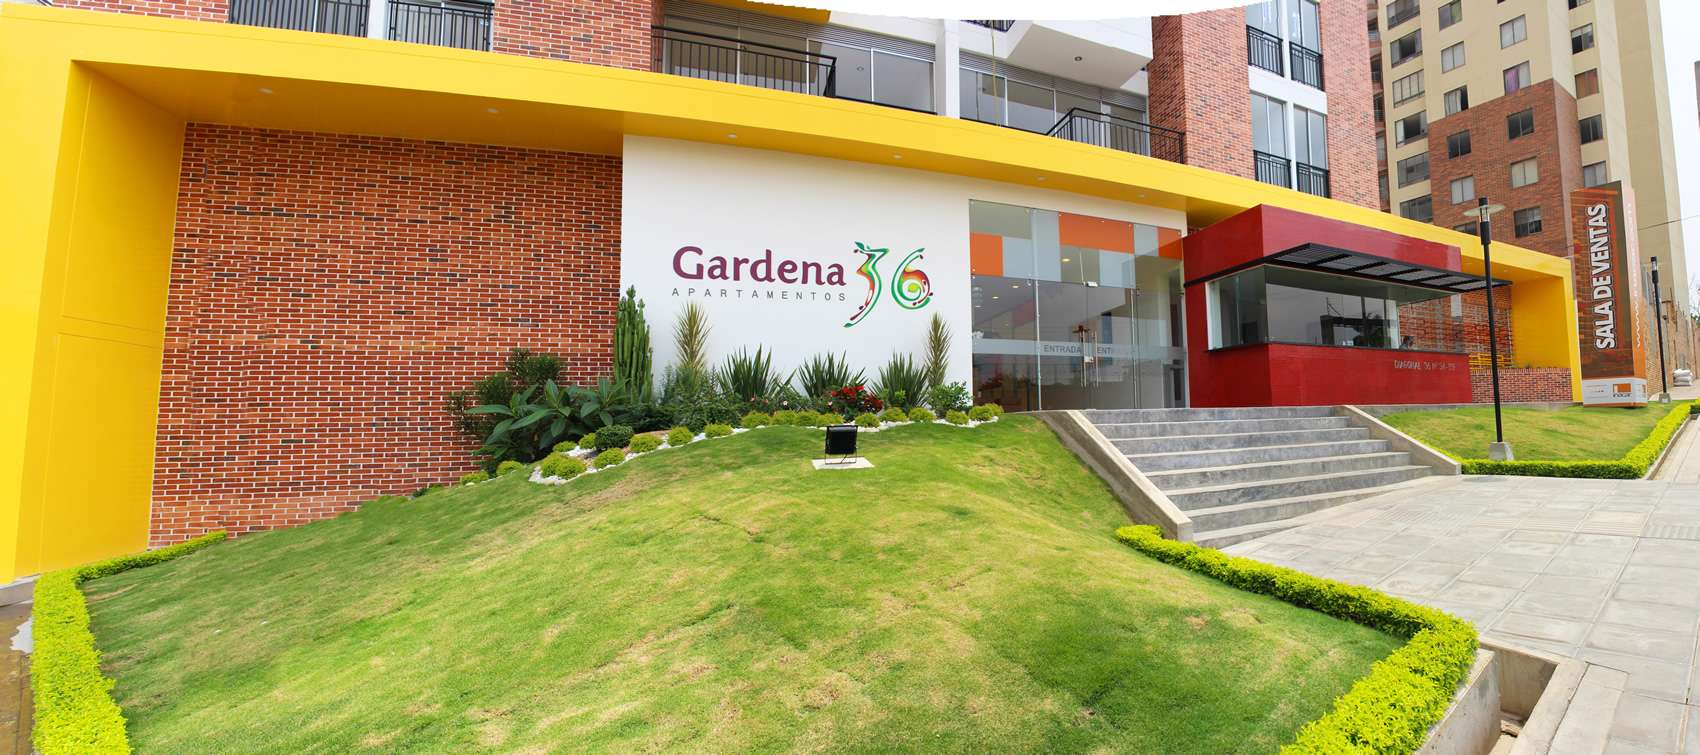 Gardena 36-Floridablanca